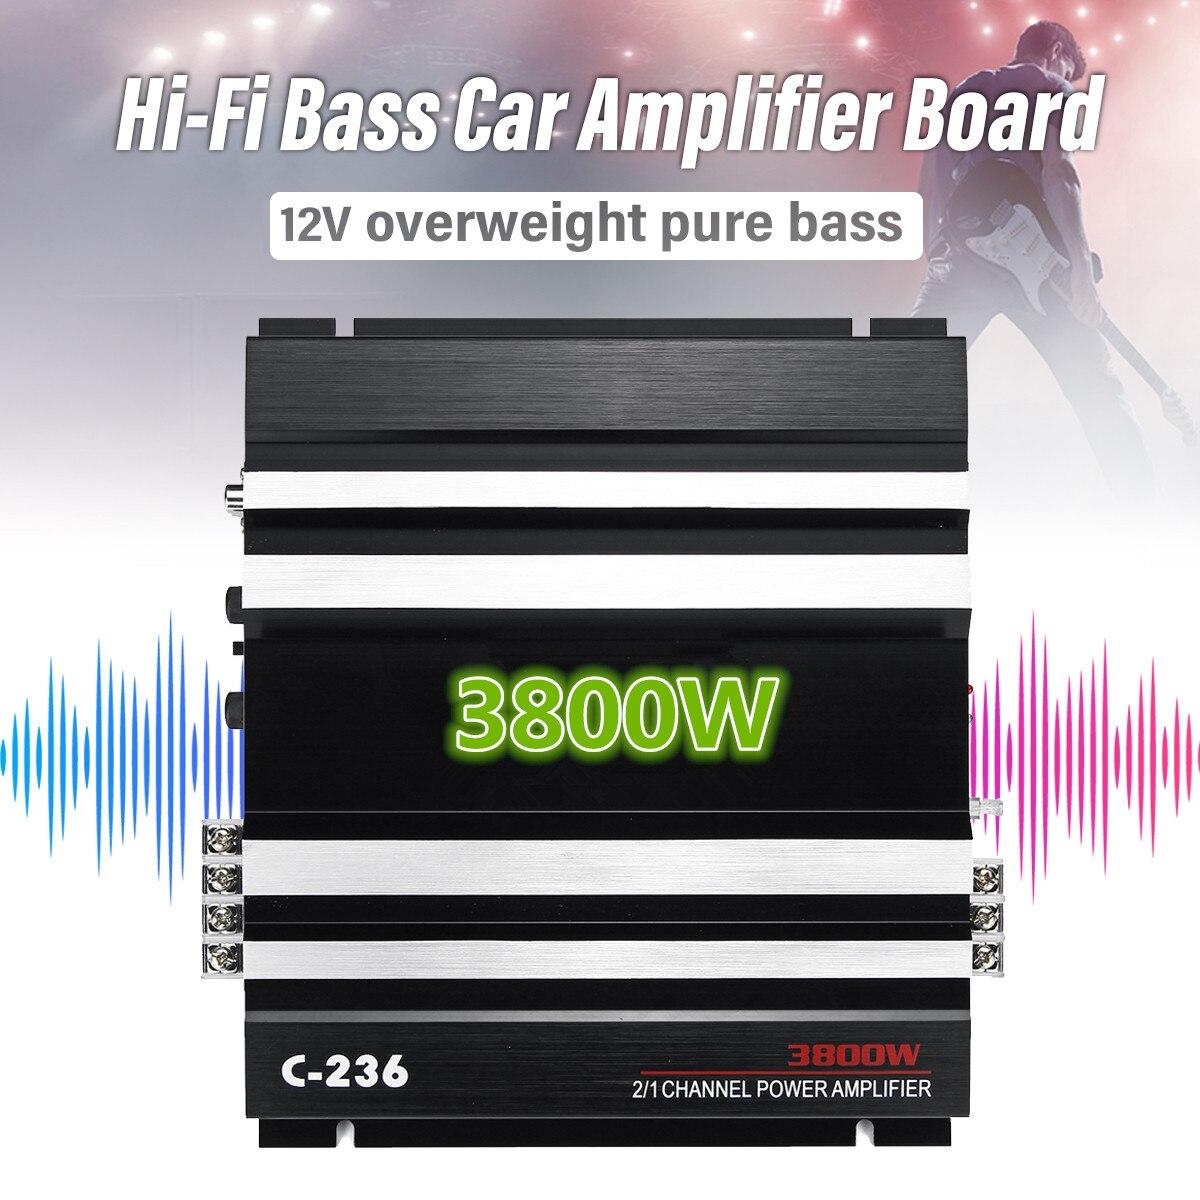 3800W 12V Car Amplifier Multichannel Powerful Car Audio Subwoofer Aluminum Alloy Vehicle Power Stereo Amp Car Sound Amplifiers